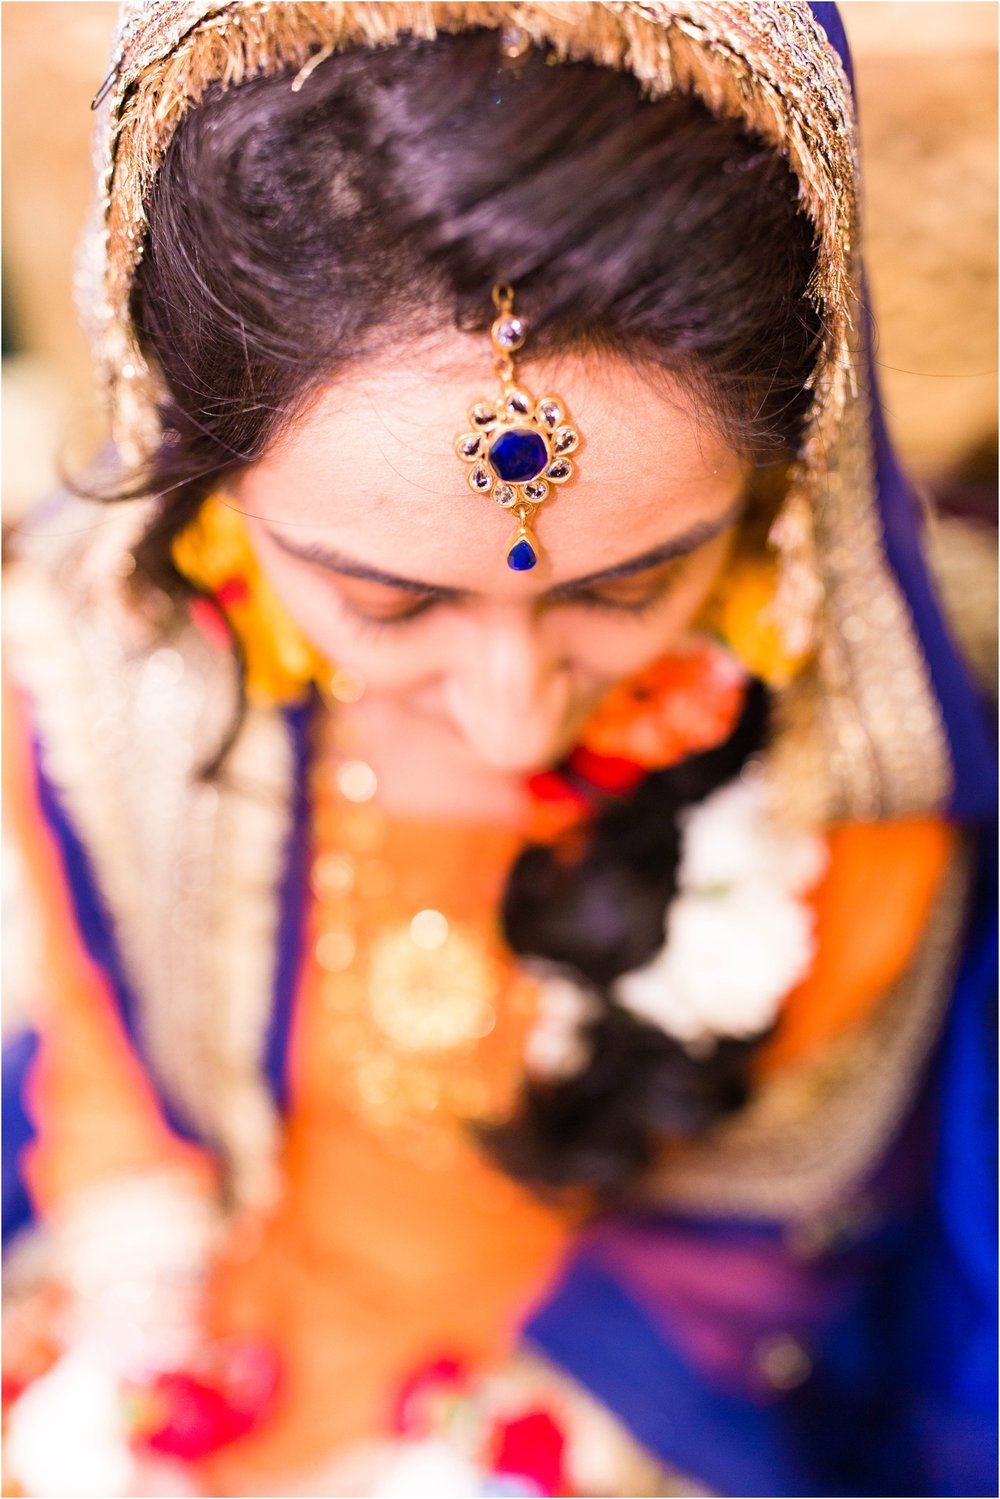 Mehndi-Markham-Convention-Centre-Toronto-Mississauga-Brampton-Scarborough-GTA-Pakistani-Indian-Wedding-Engagement-Photographer-Photography_0018.jpg